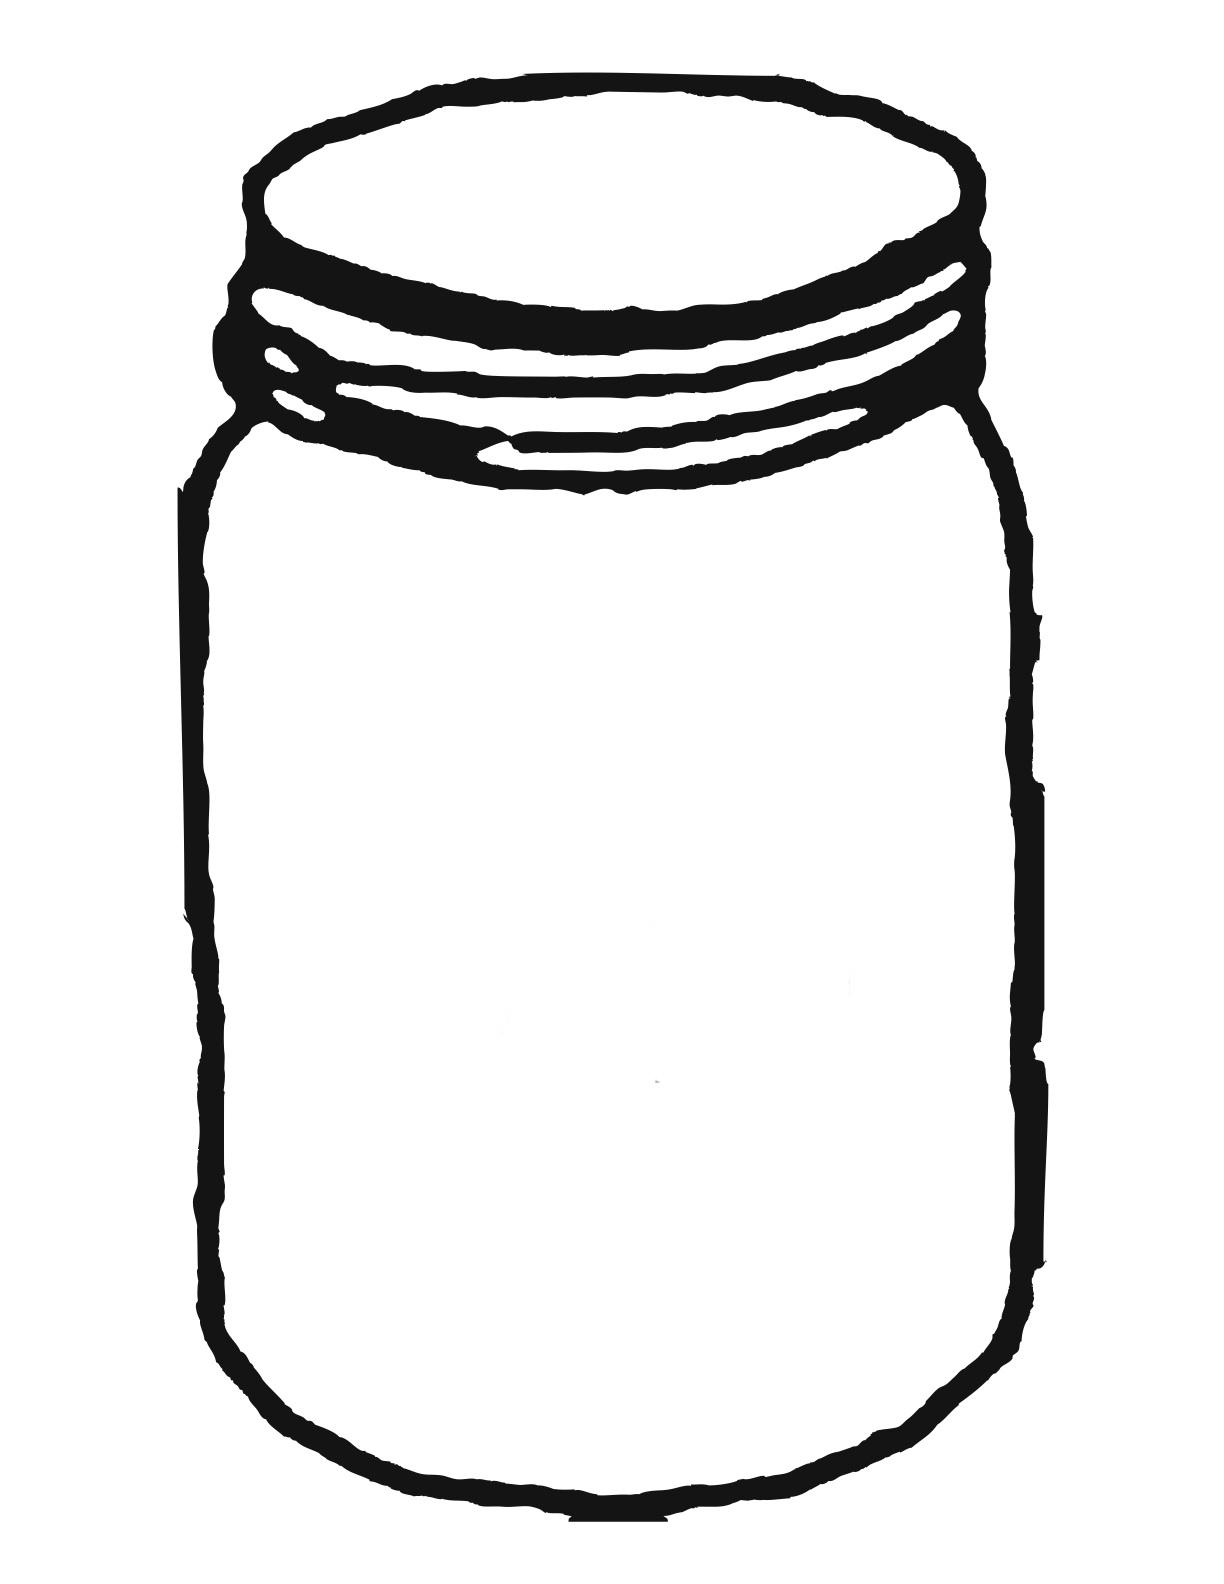 Free Jar Clip Art Black And White, Download Free Clip Art.